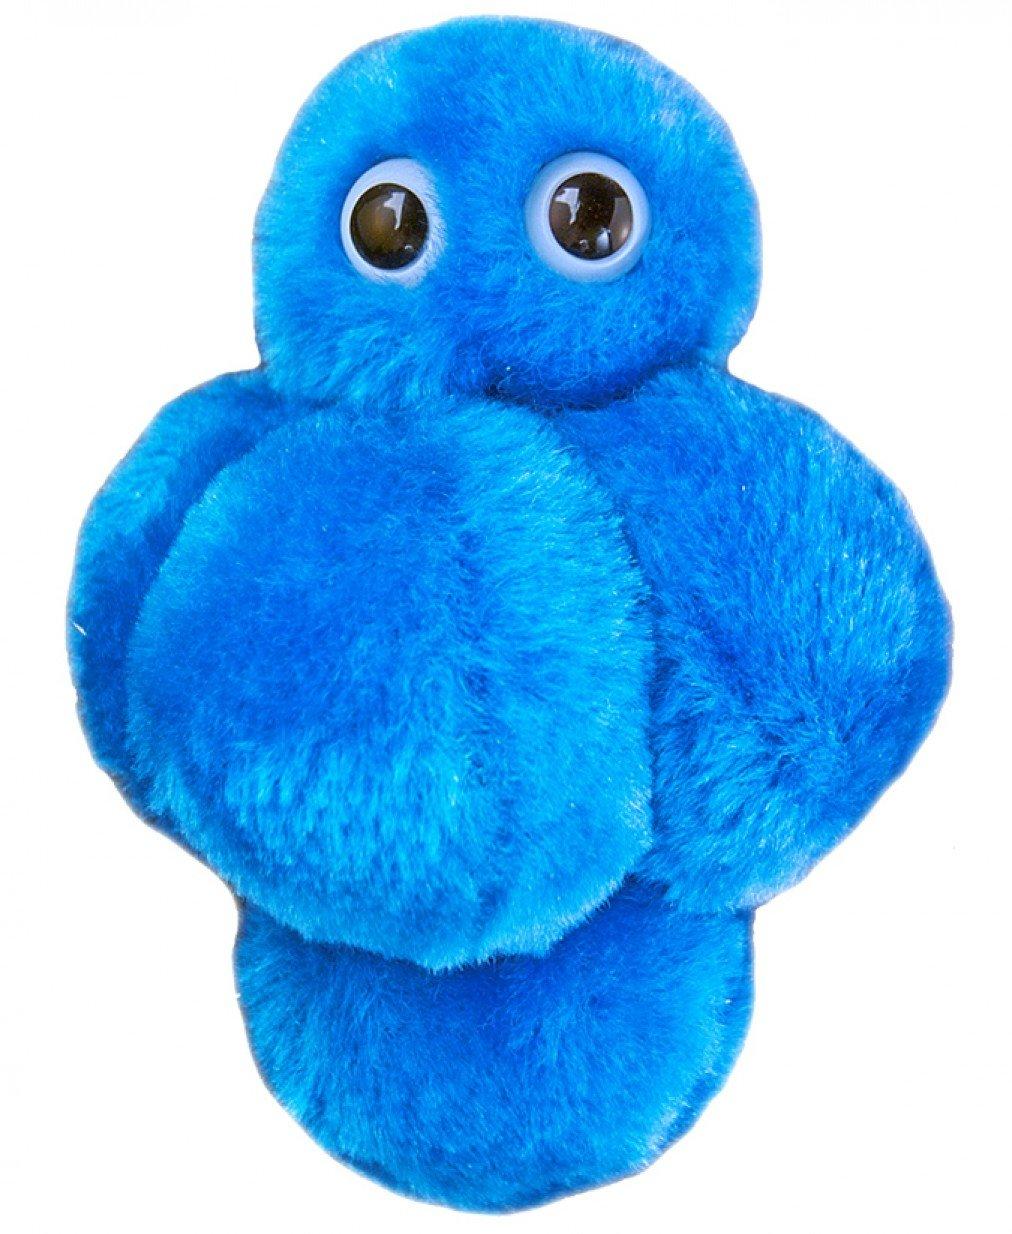 Amazon.com: Giant Microbes Staph (Staphylococcus aureus) Plush Toy: Toys & Games